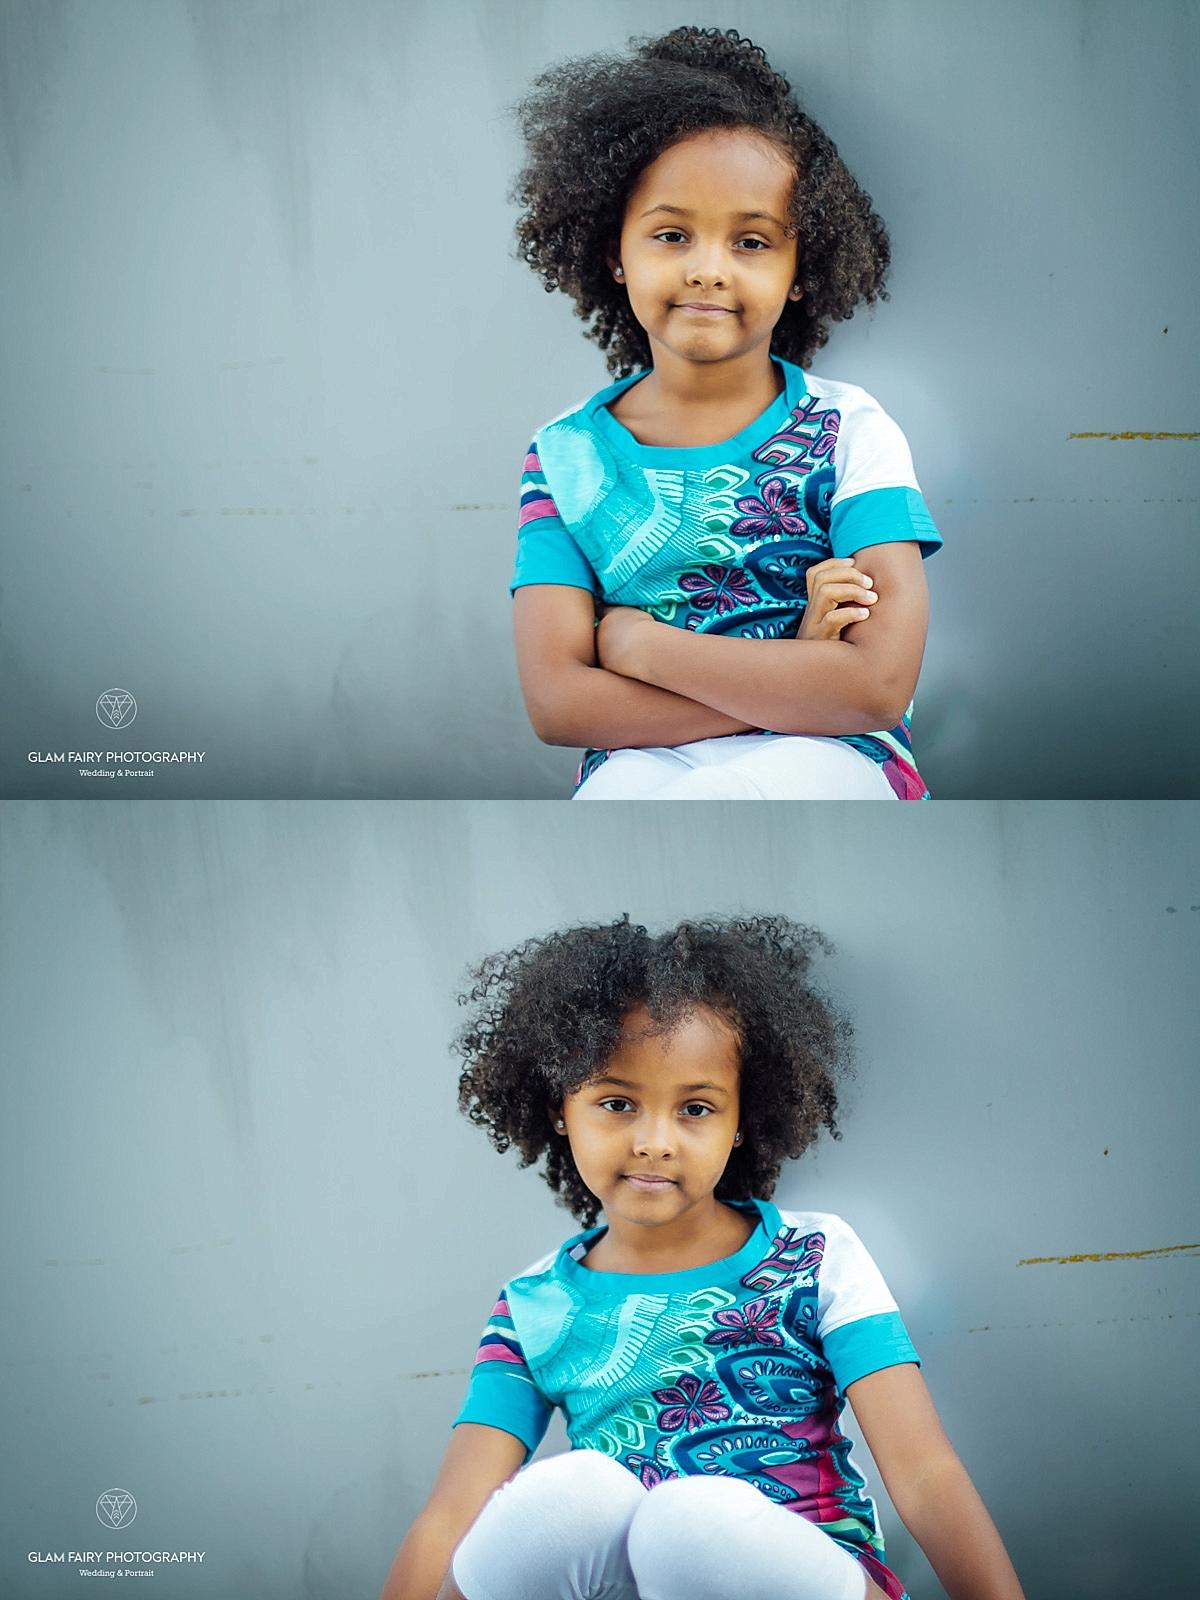 GlamFairyPhotography-séance-photo-enfant-bnf-yaelle_0008